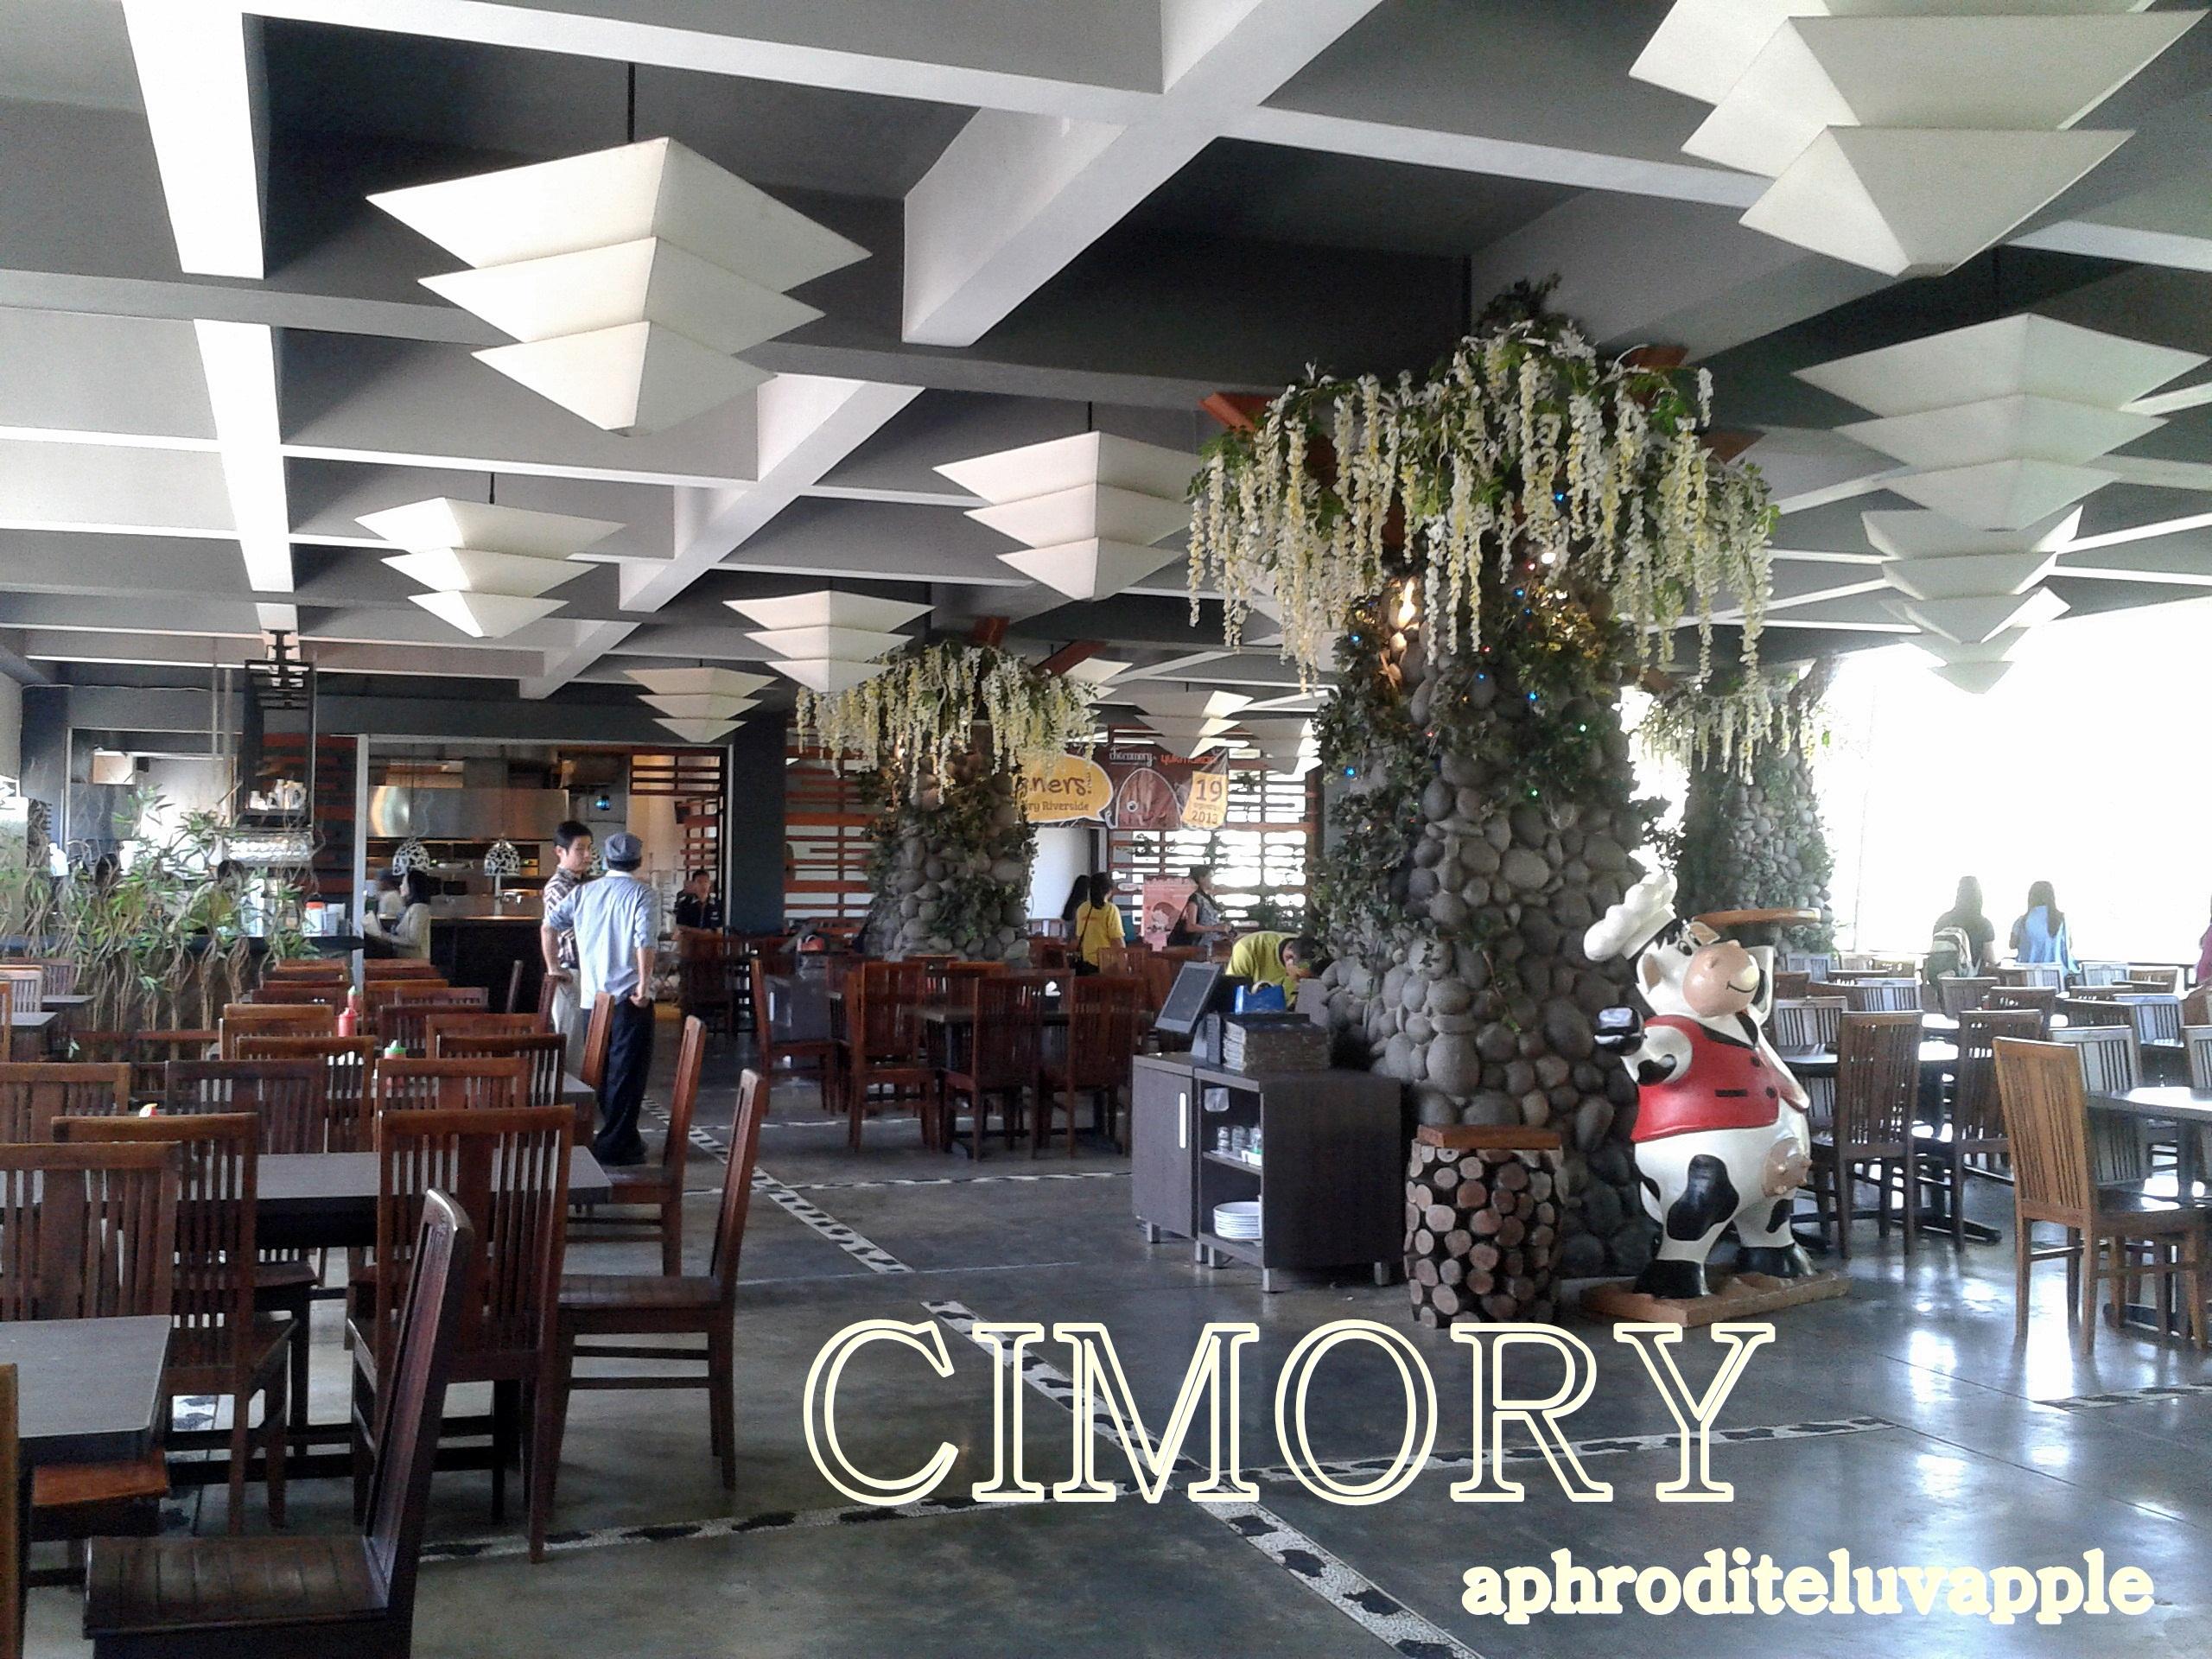 Pariwisata Aphroditeluvapple Blog Image Cimory Riverside Kab Bogor